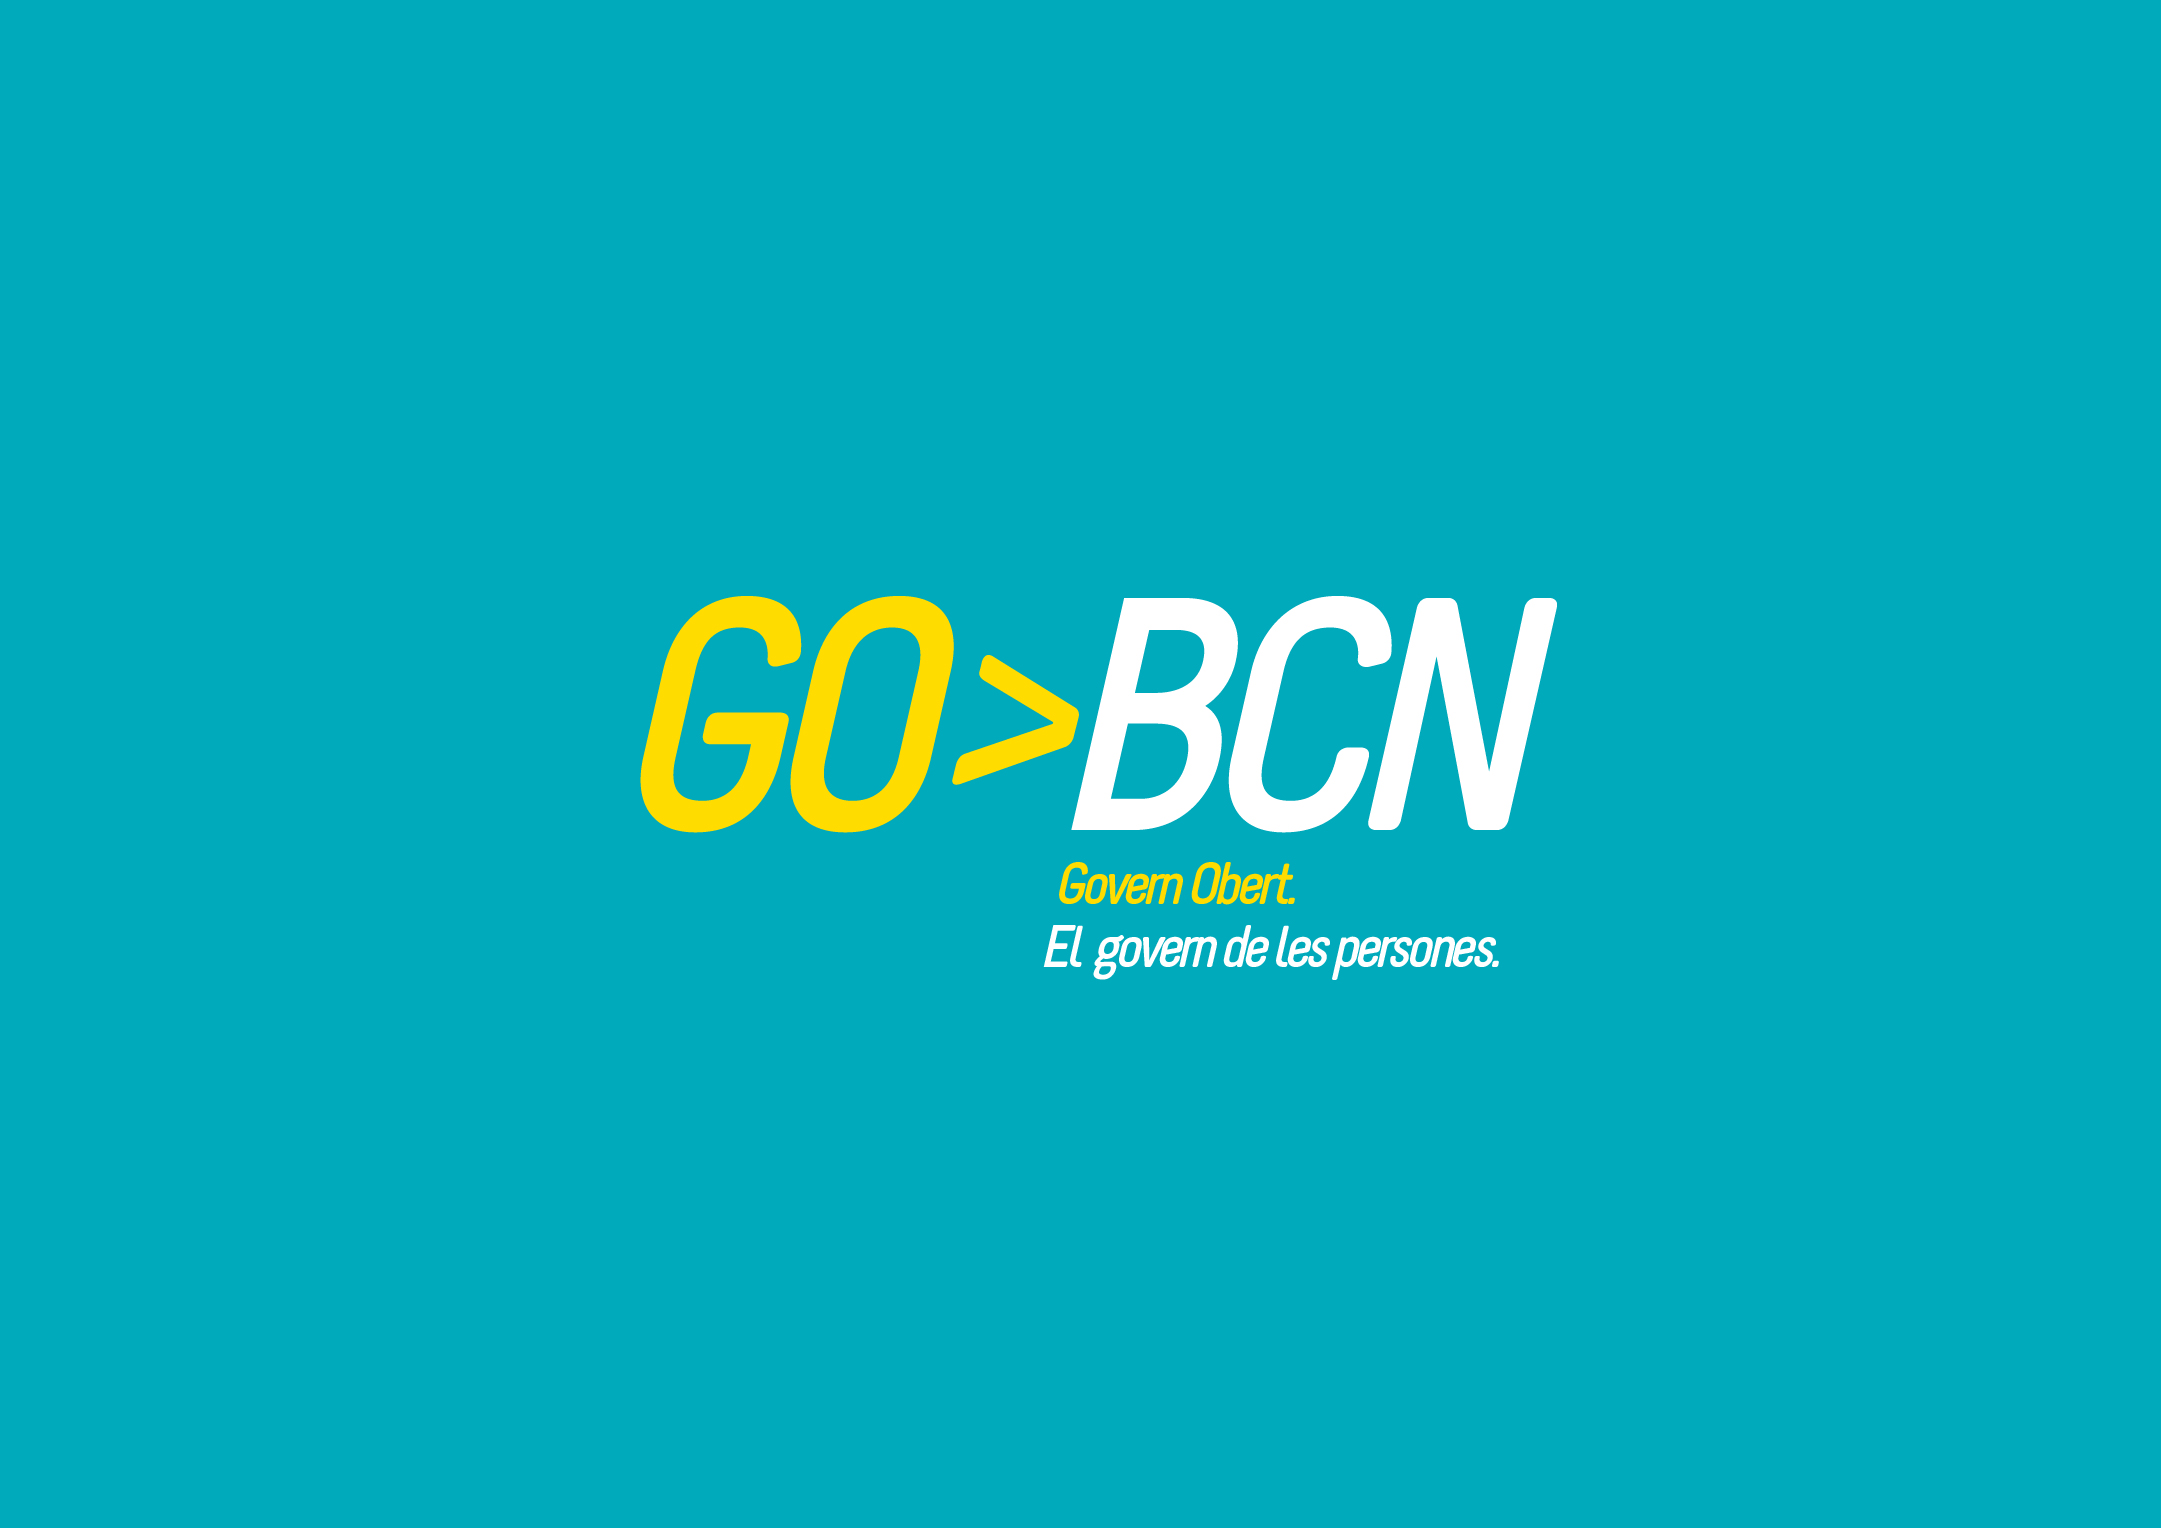 gobcn-11.jpg